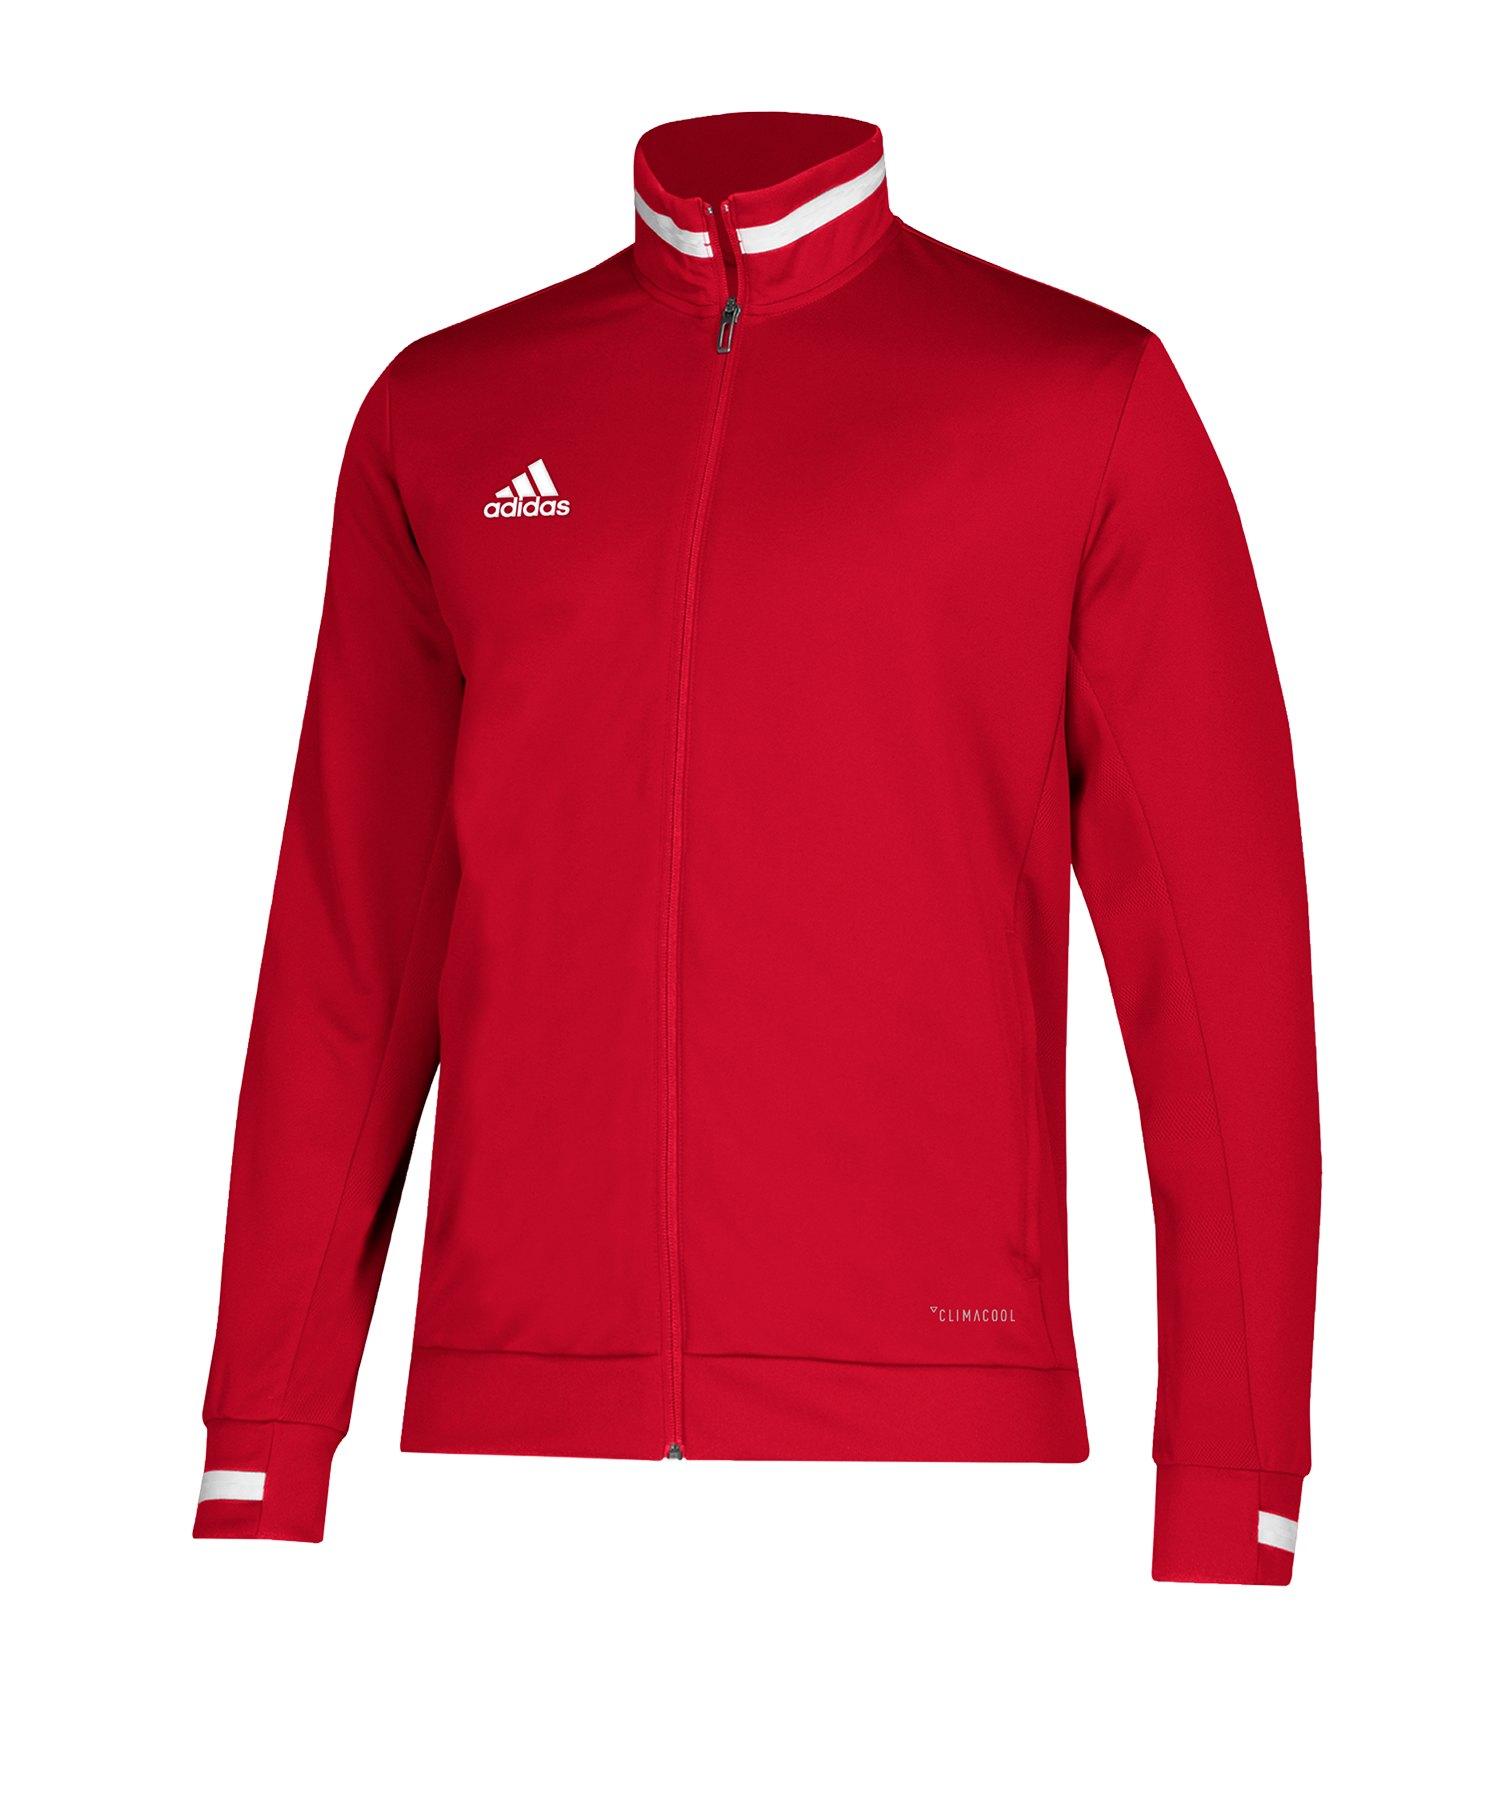 adidas Team 19 Track Jacket Jacke Rot Weiss - rot